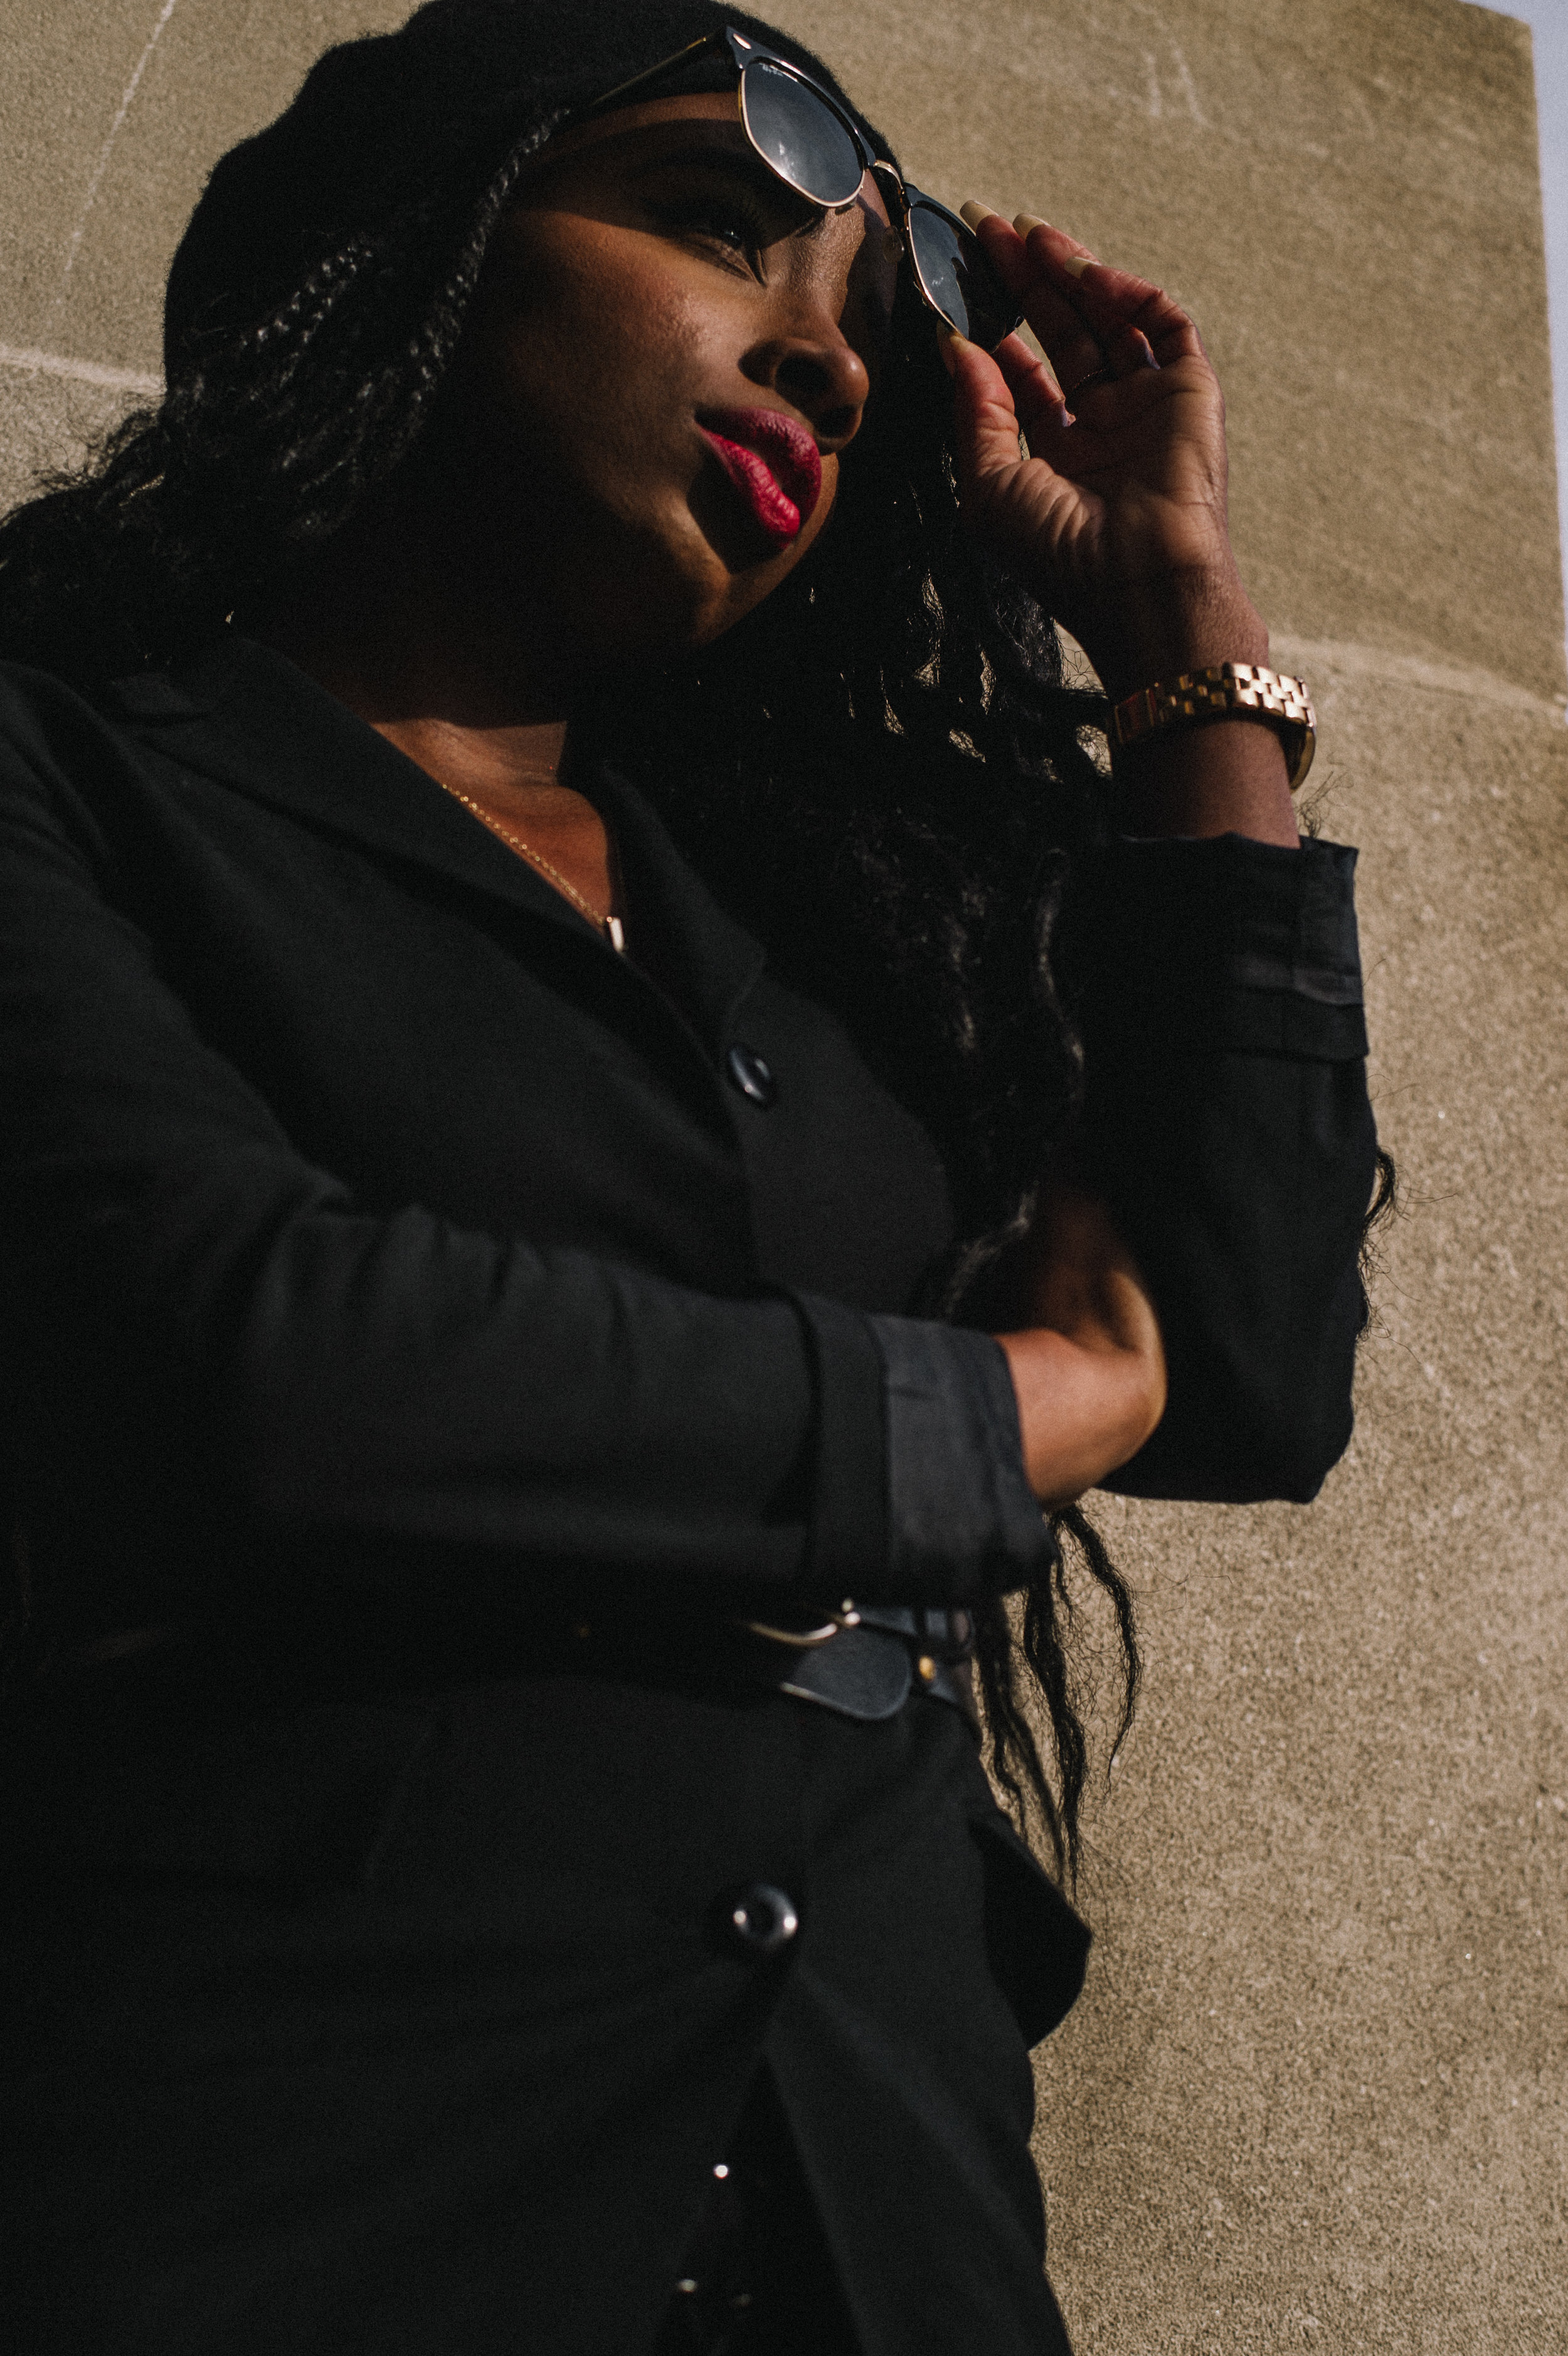 Tasha-James-The-Glossier-Gaston-Luga-Fashion-Style-DC-Blogger-82.jpg